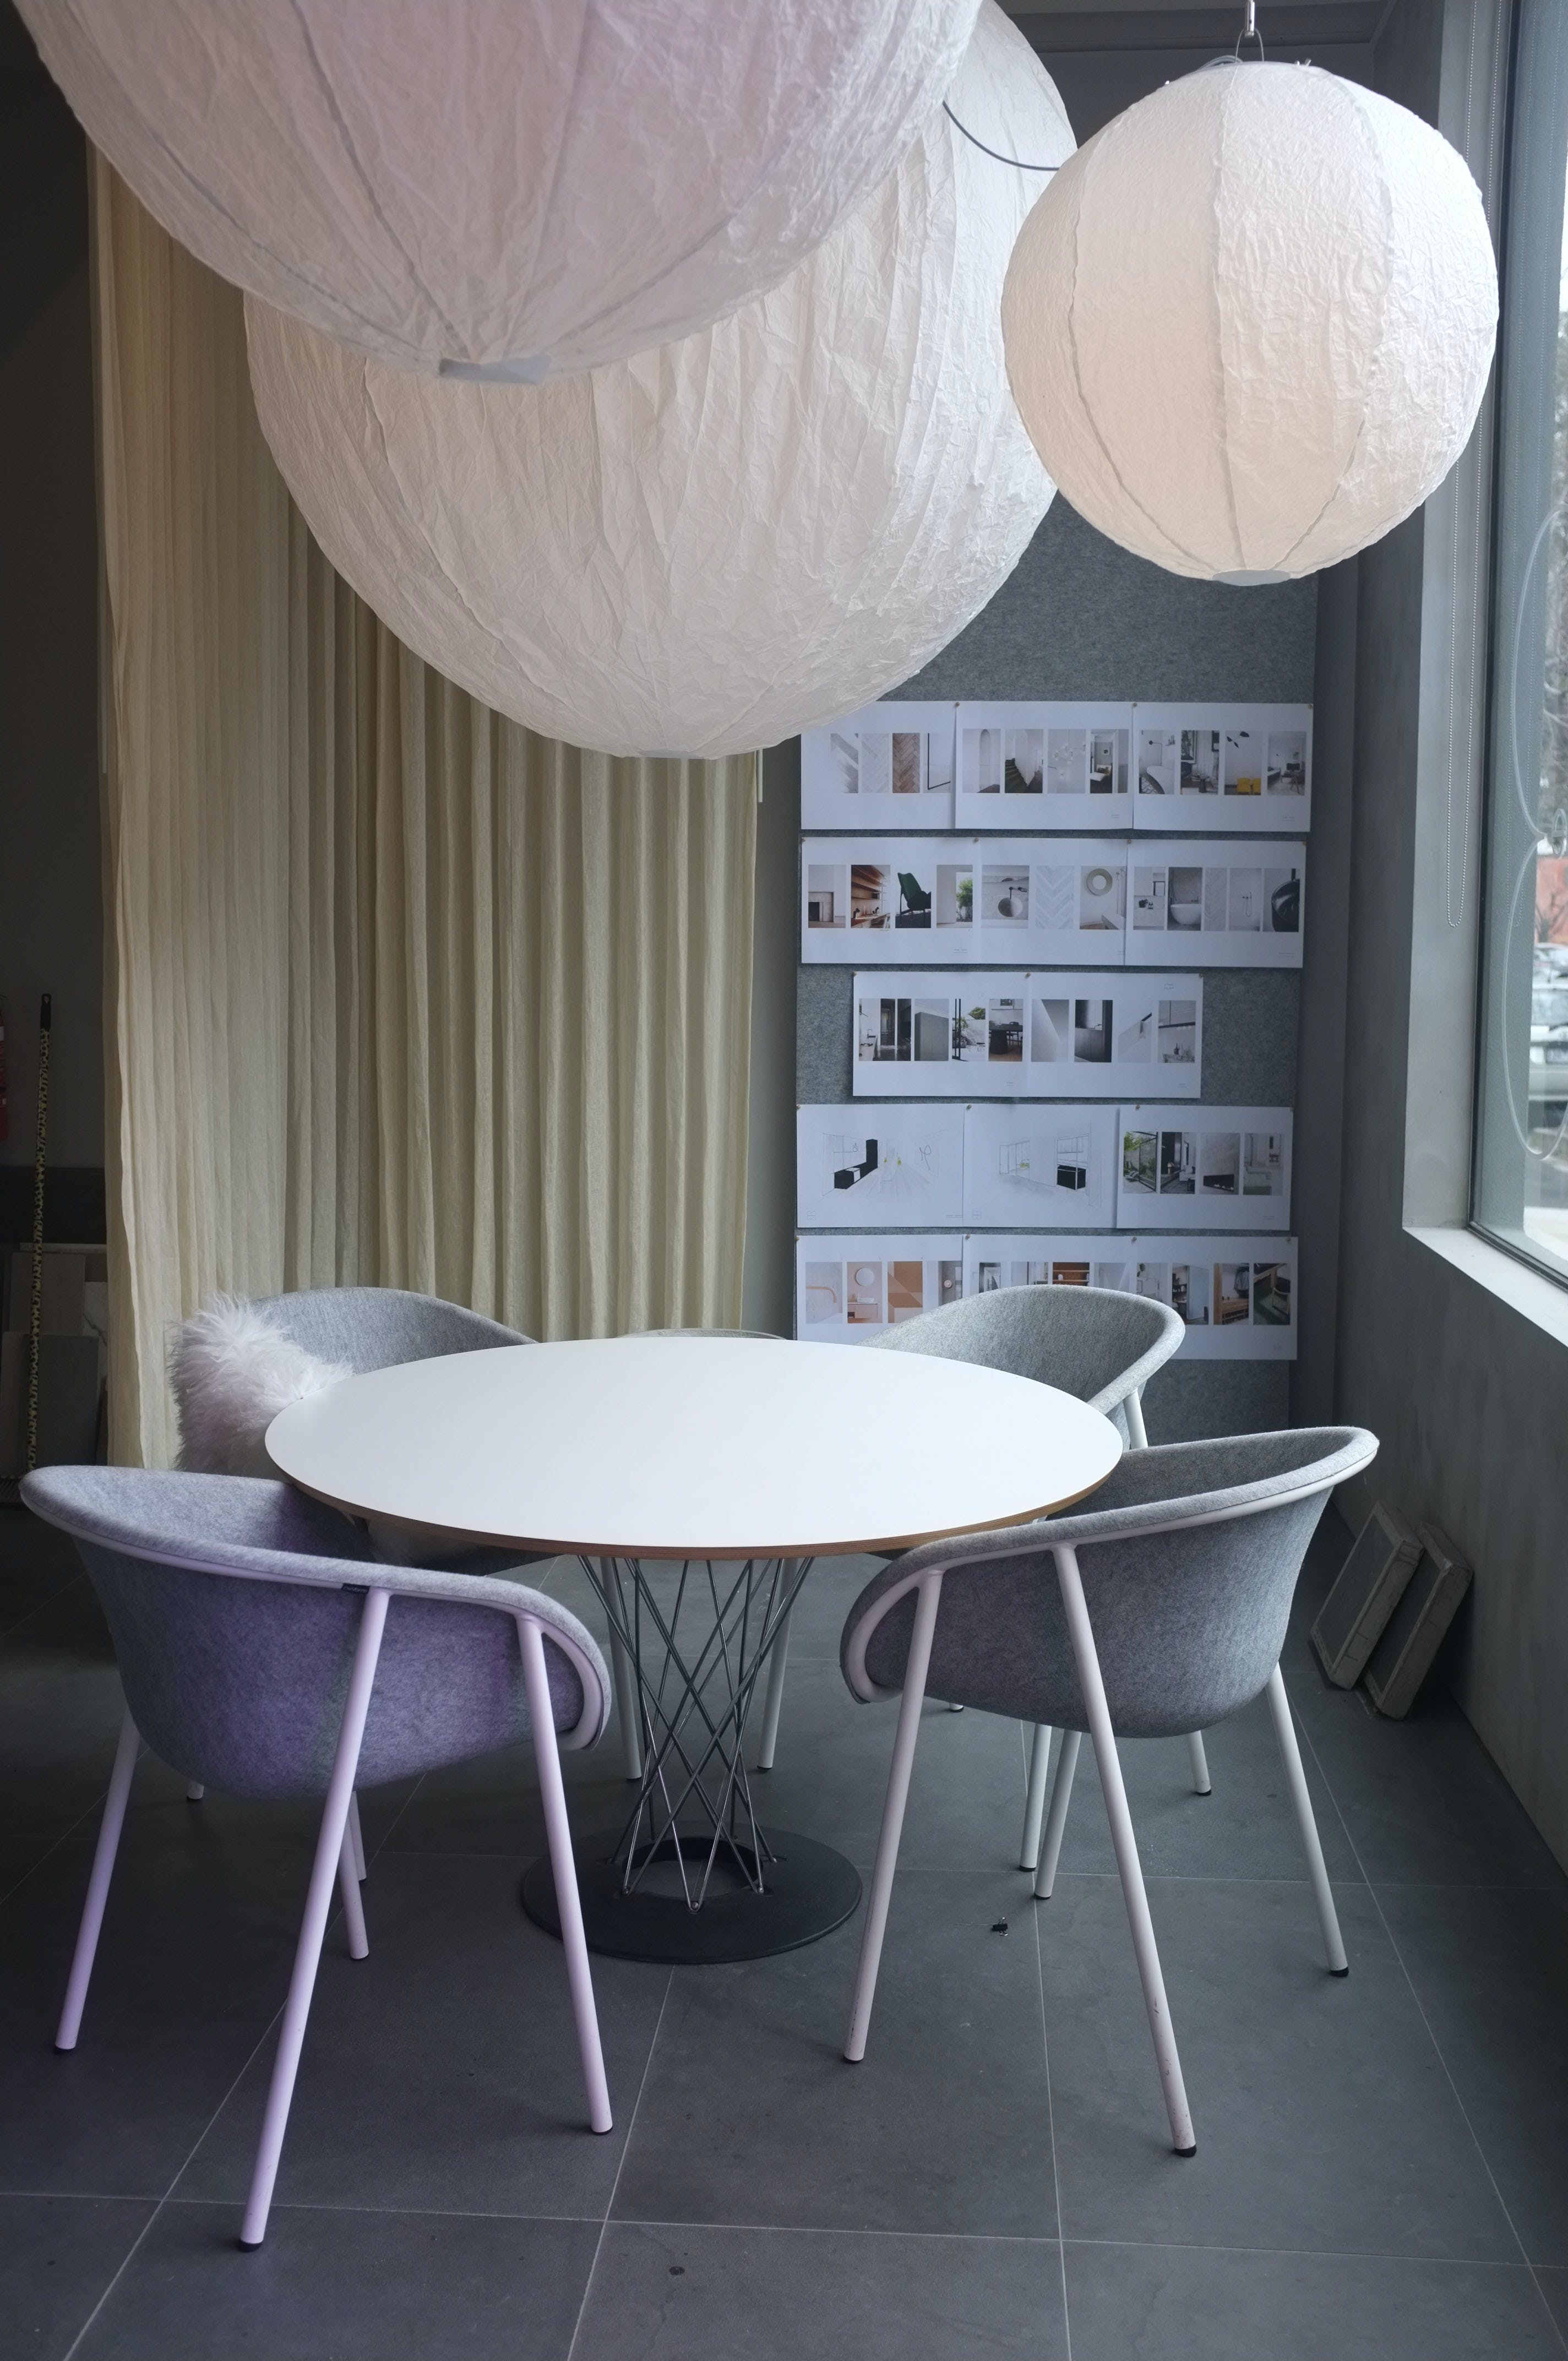 Share Space, shopfront at Design Studio, image 1